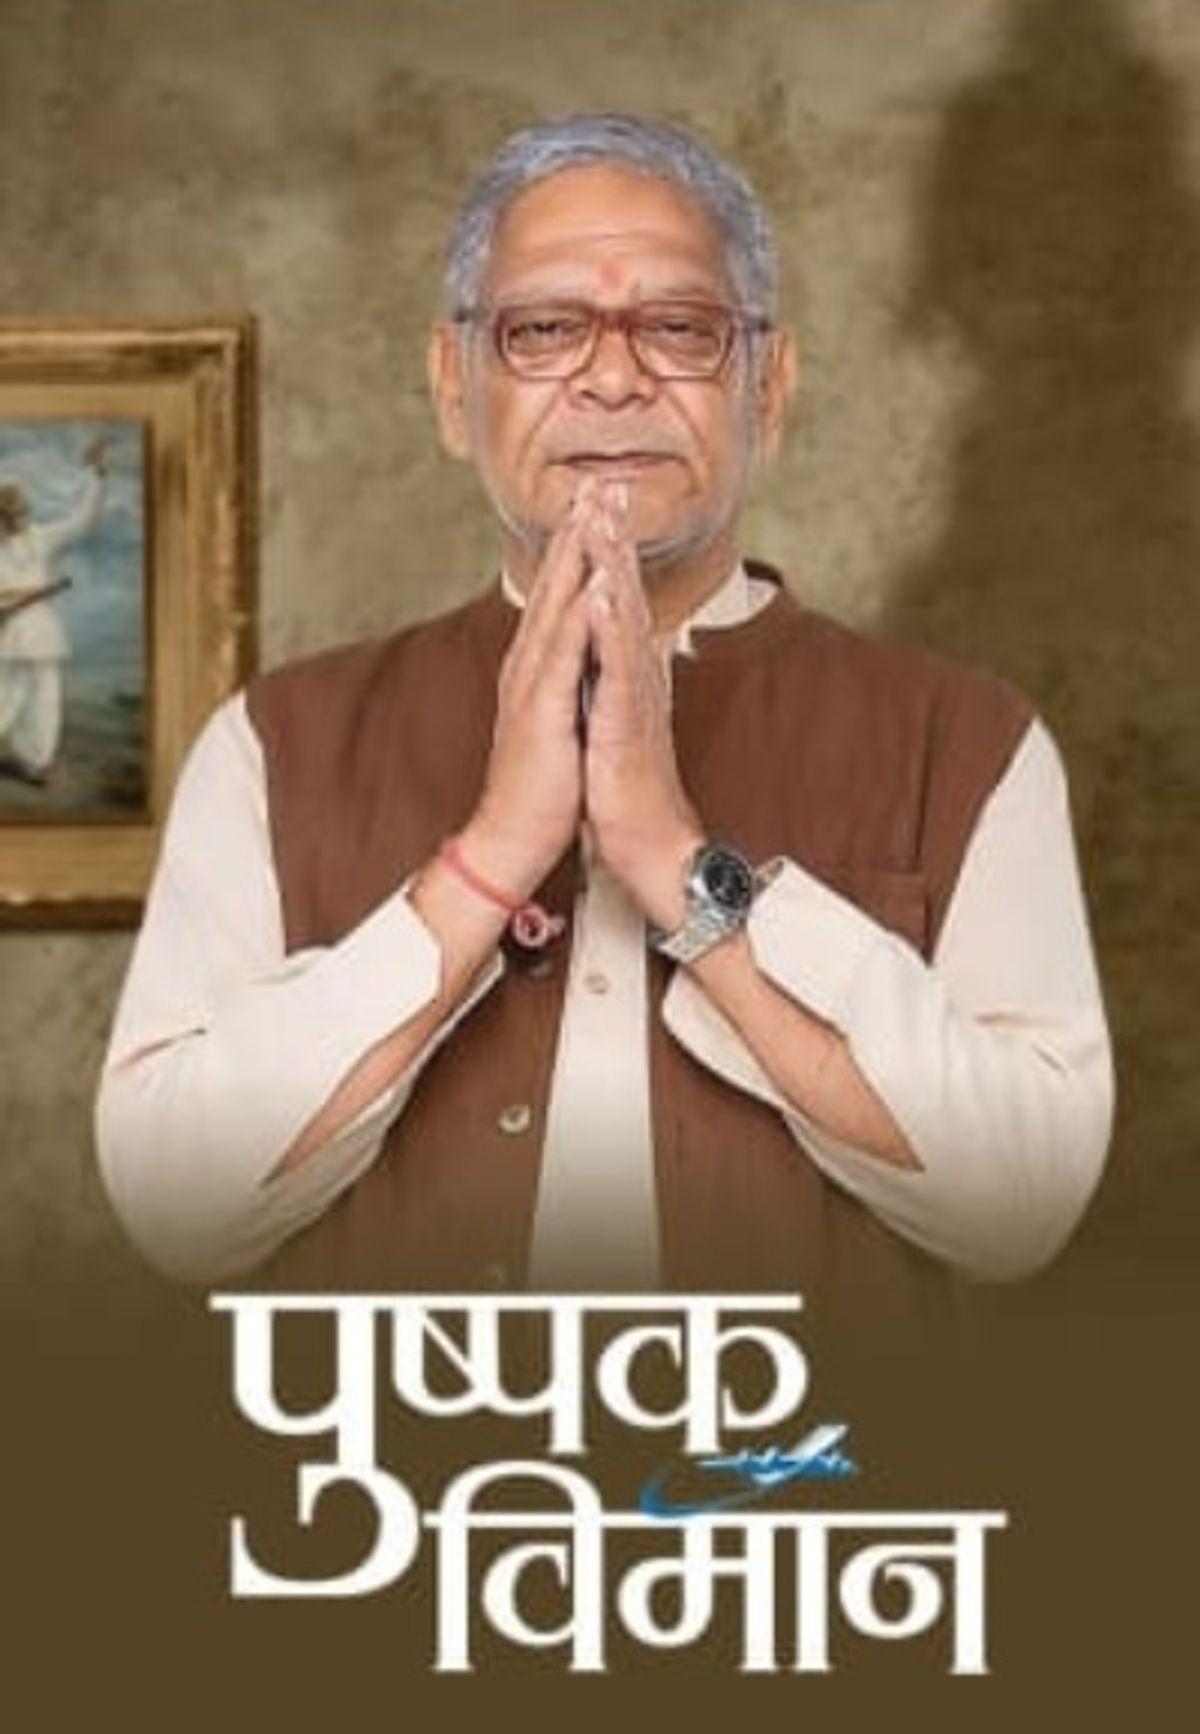 Vaibhav Chinchalkar Best Movies, TV Shows and Web Series List